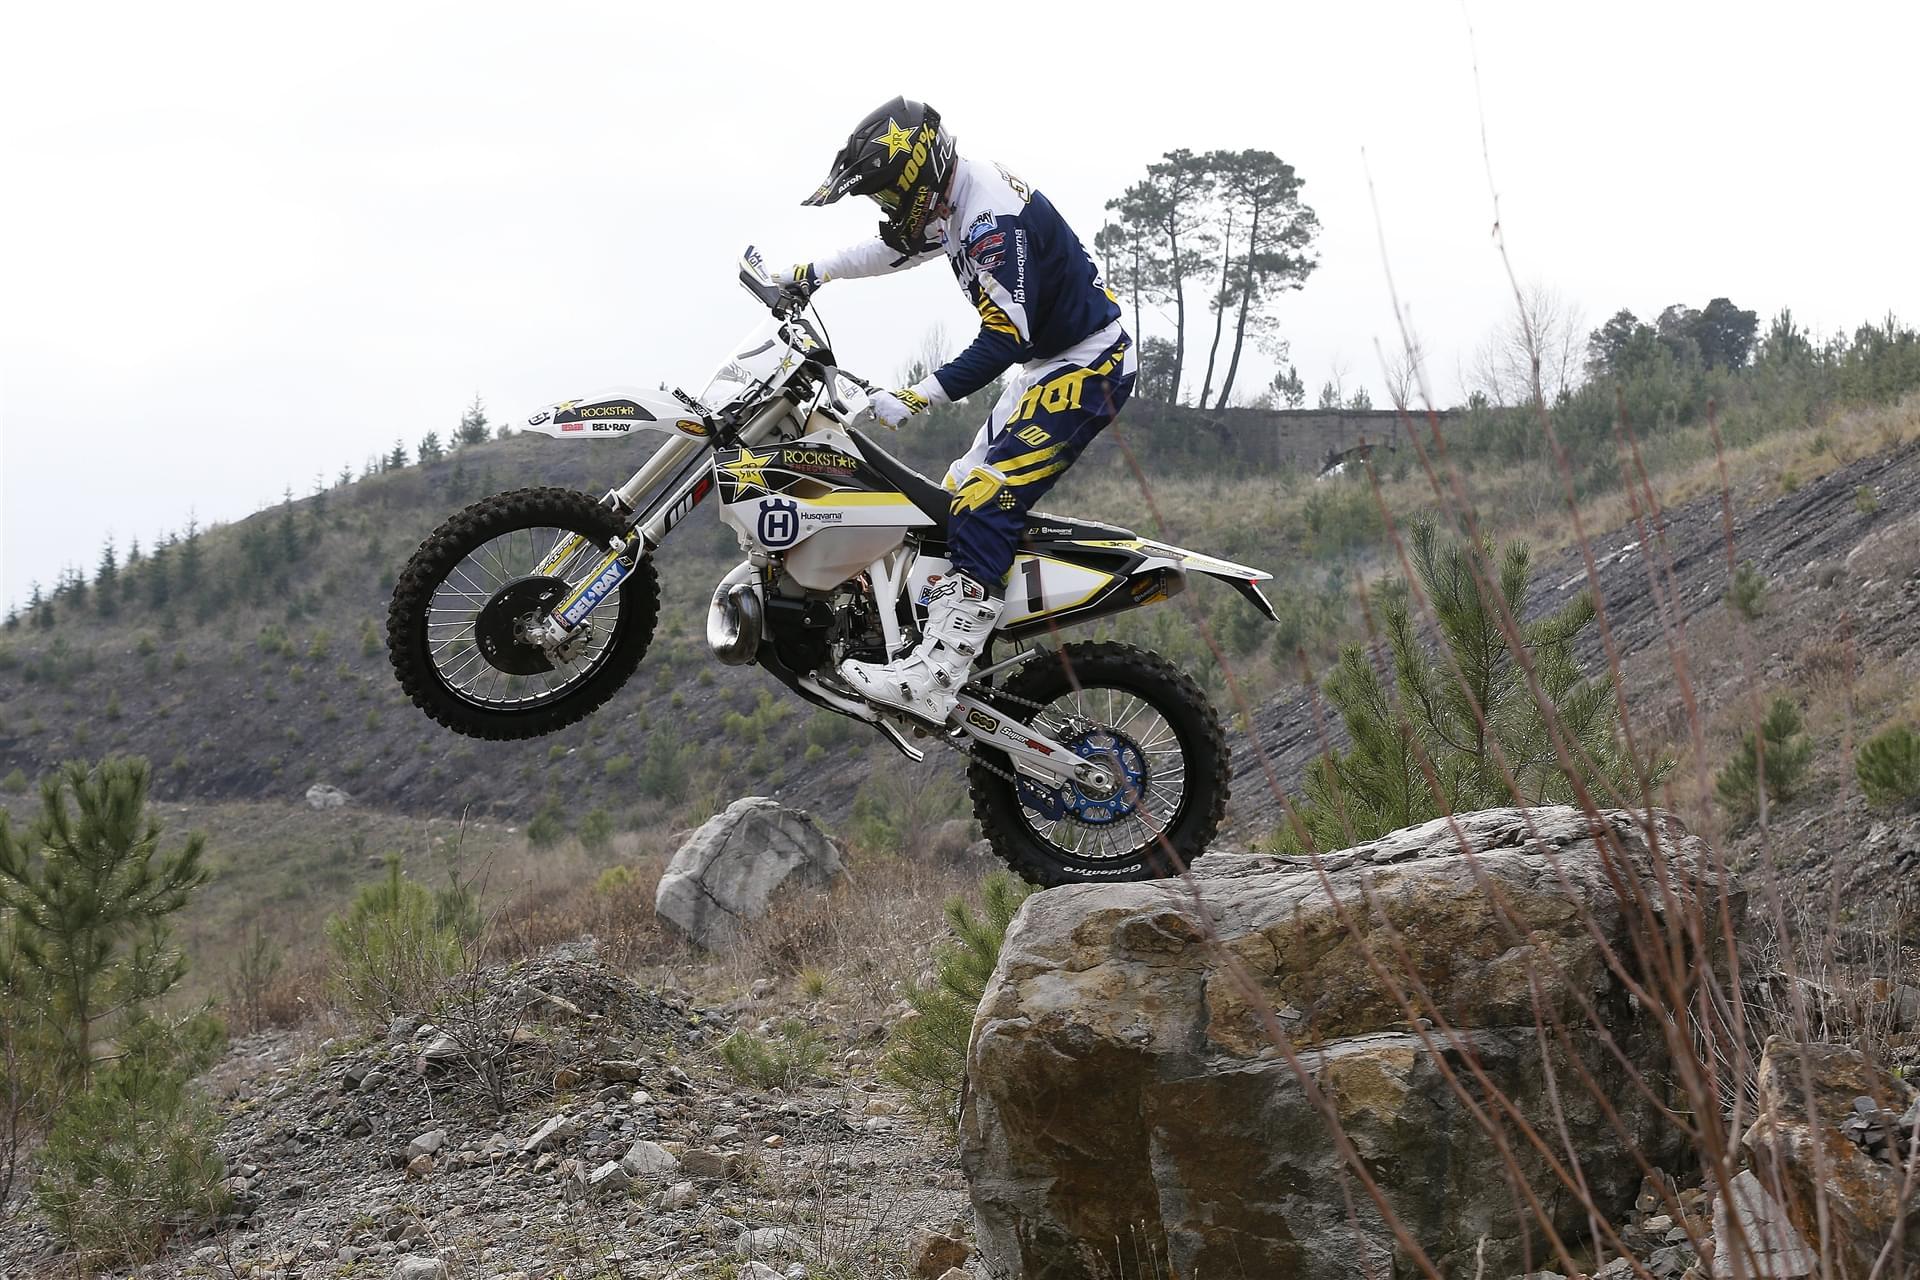 graham-jarvis-rockstar-energy-husqvarna-racing-2016.i4861-kyVxesI-w1920-l1-n1